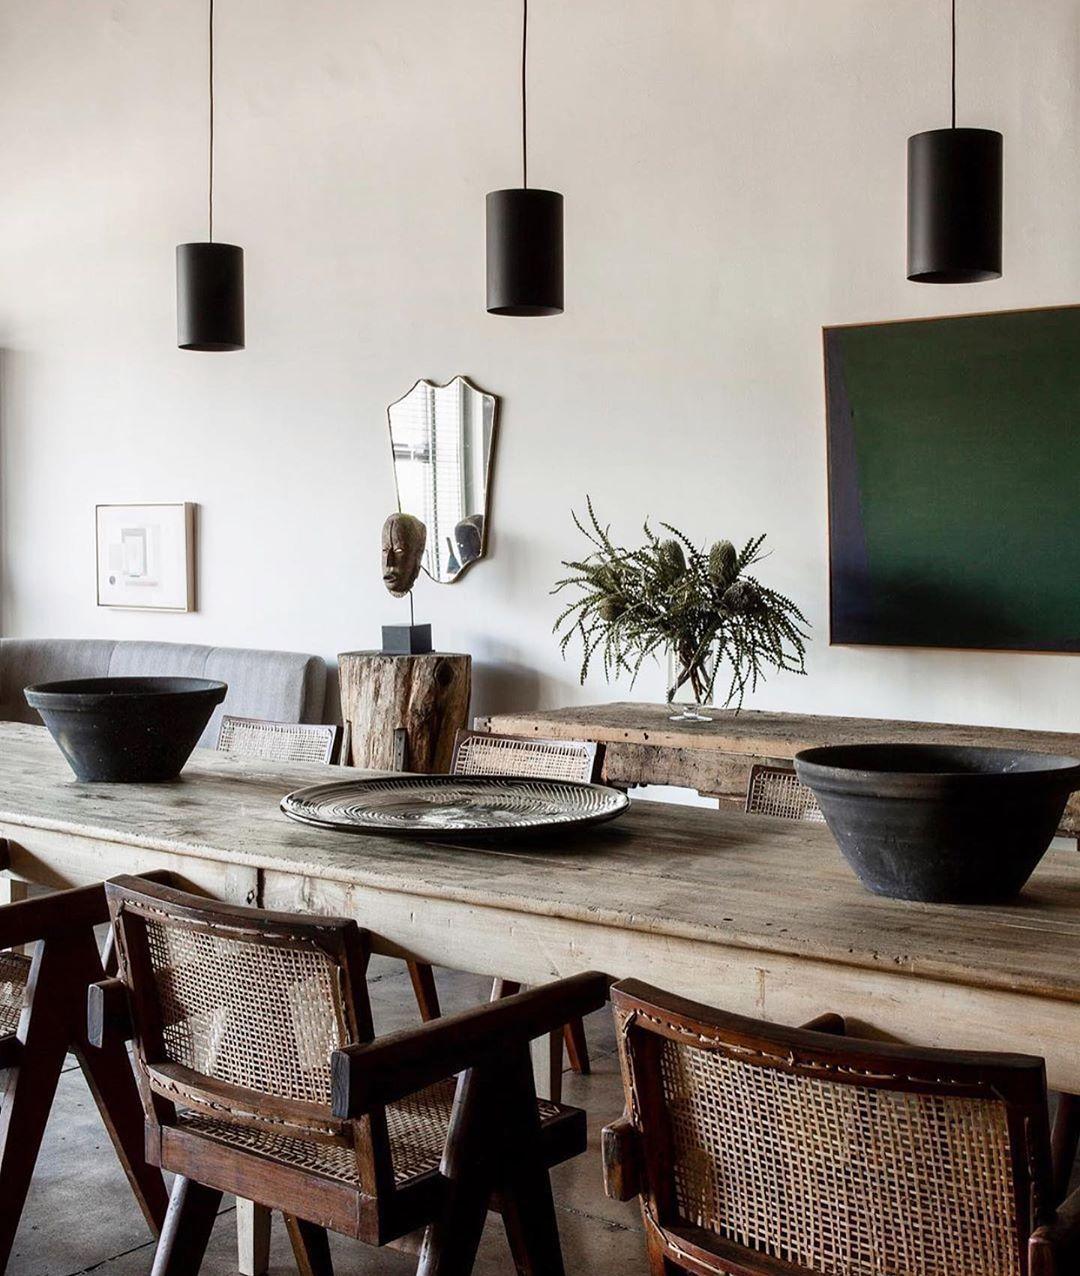 #interiors #interior #interiordecorating #interiordesign # ...